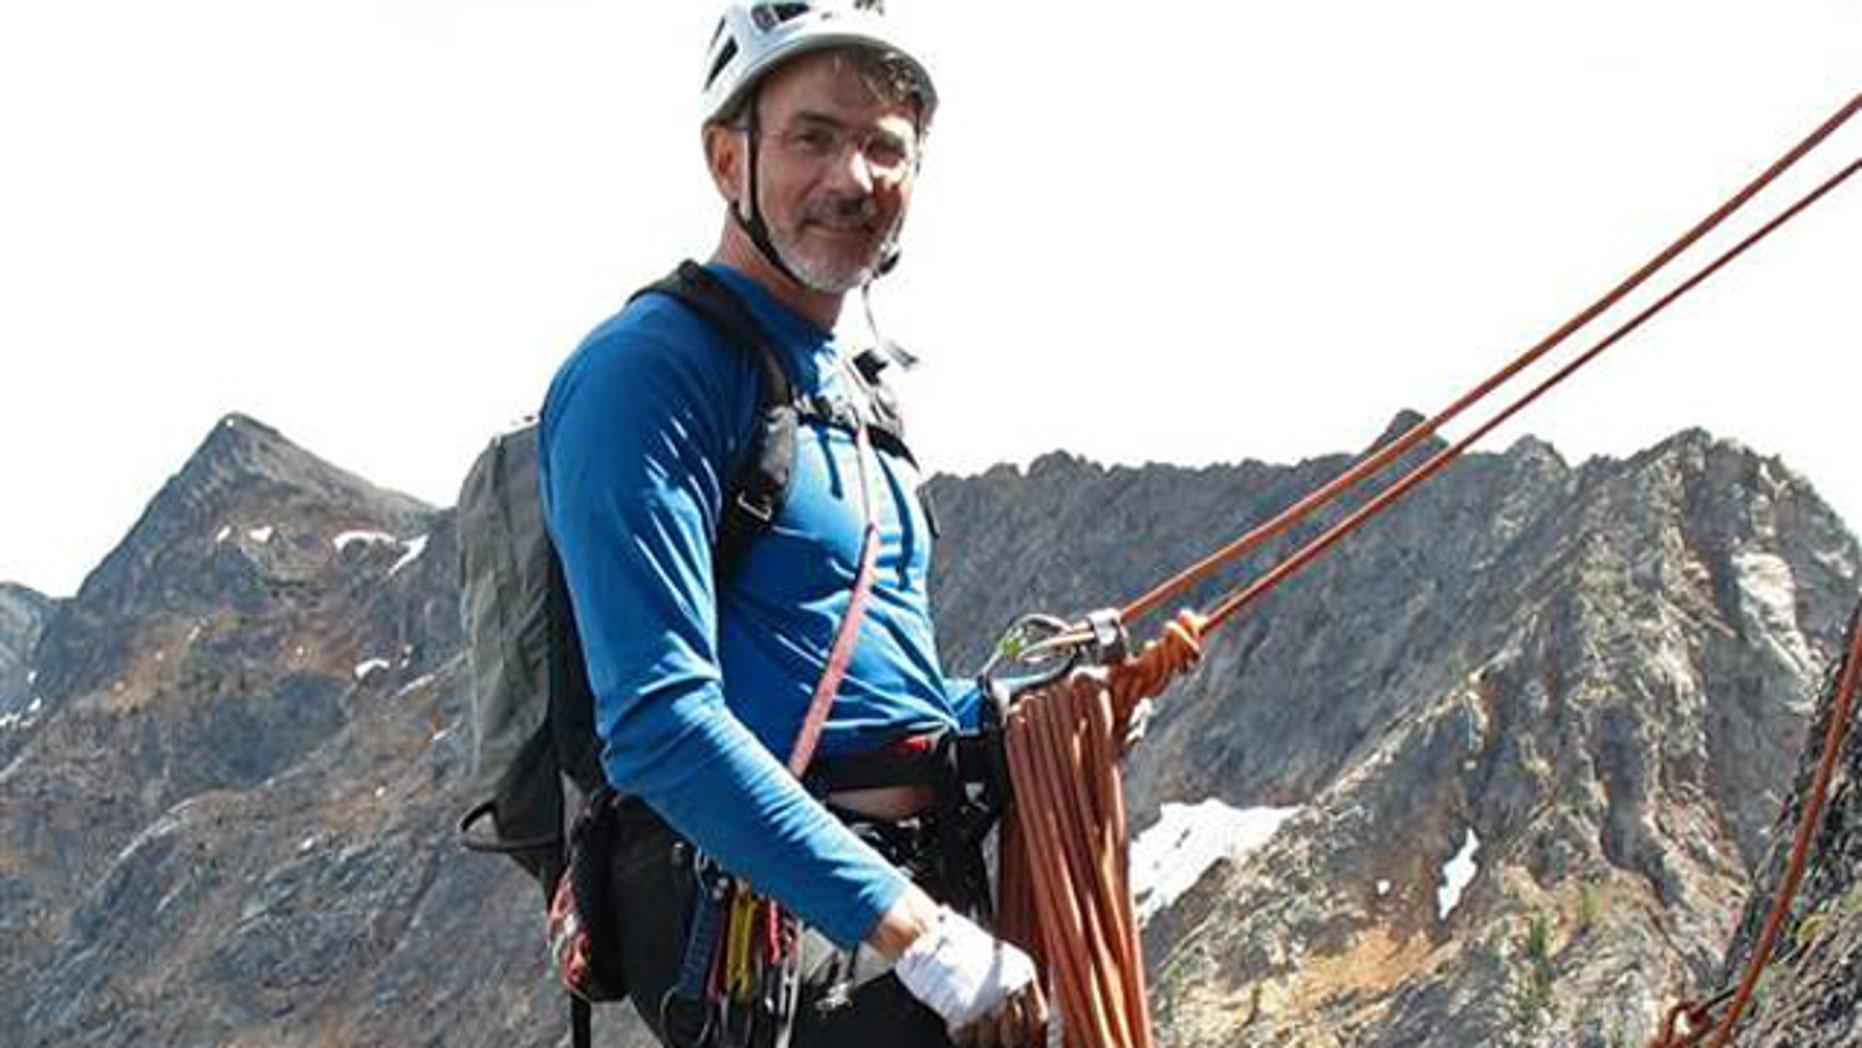 Doug Walker is pictured mountain climbing.